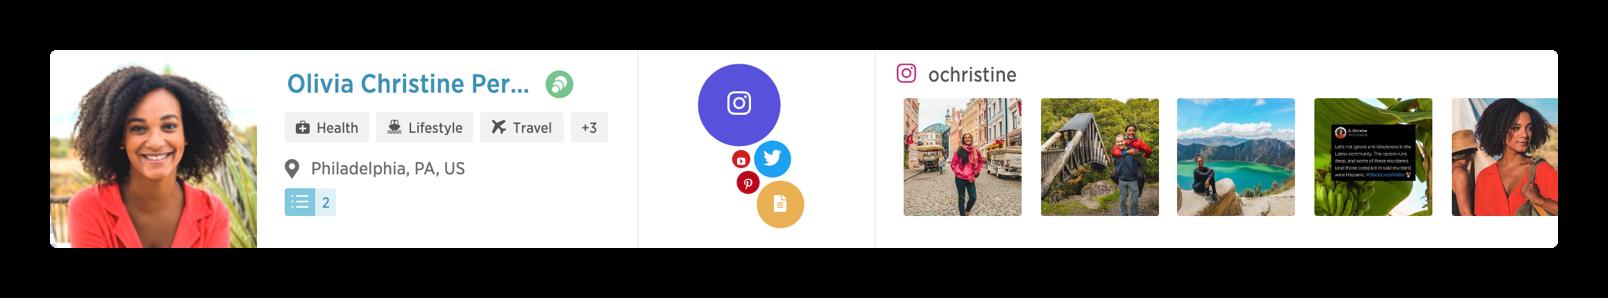 Olivia Christine Perez IZEAx statistics instagram